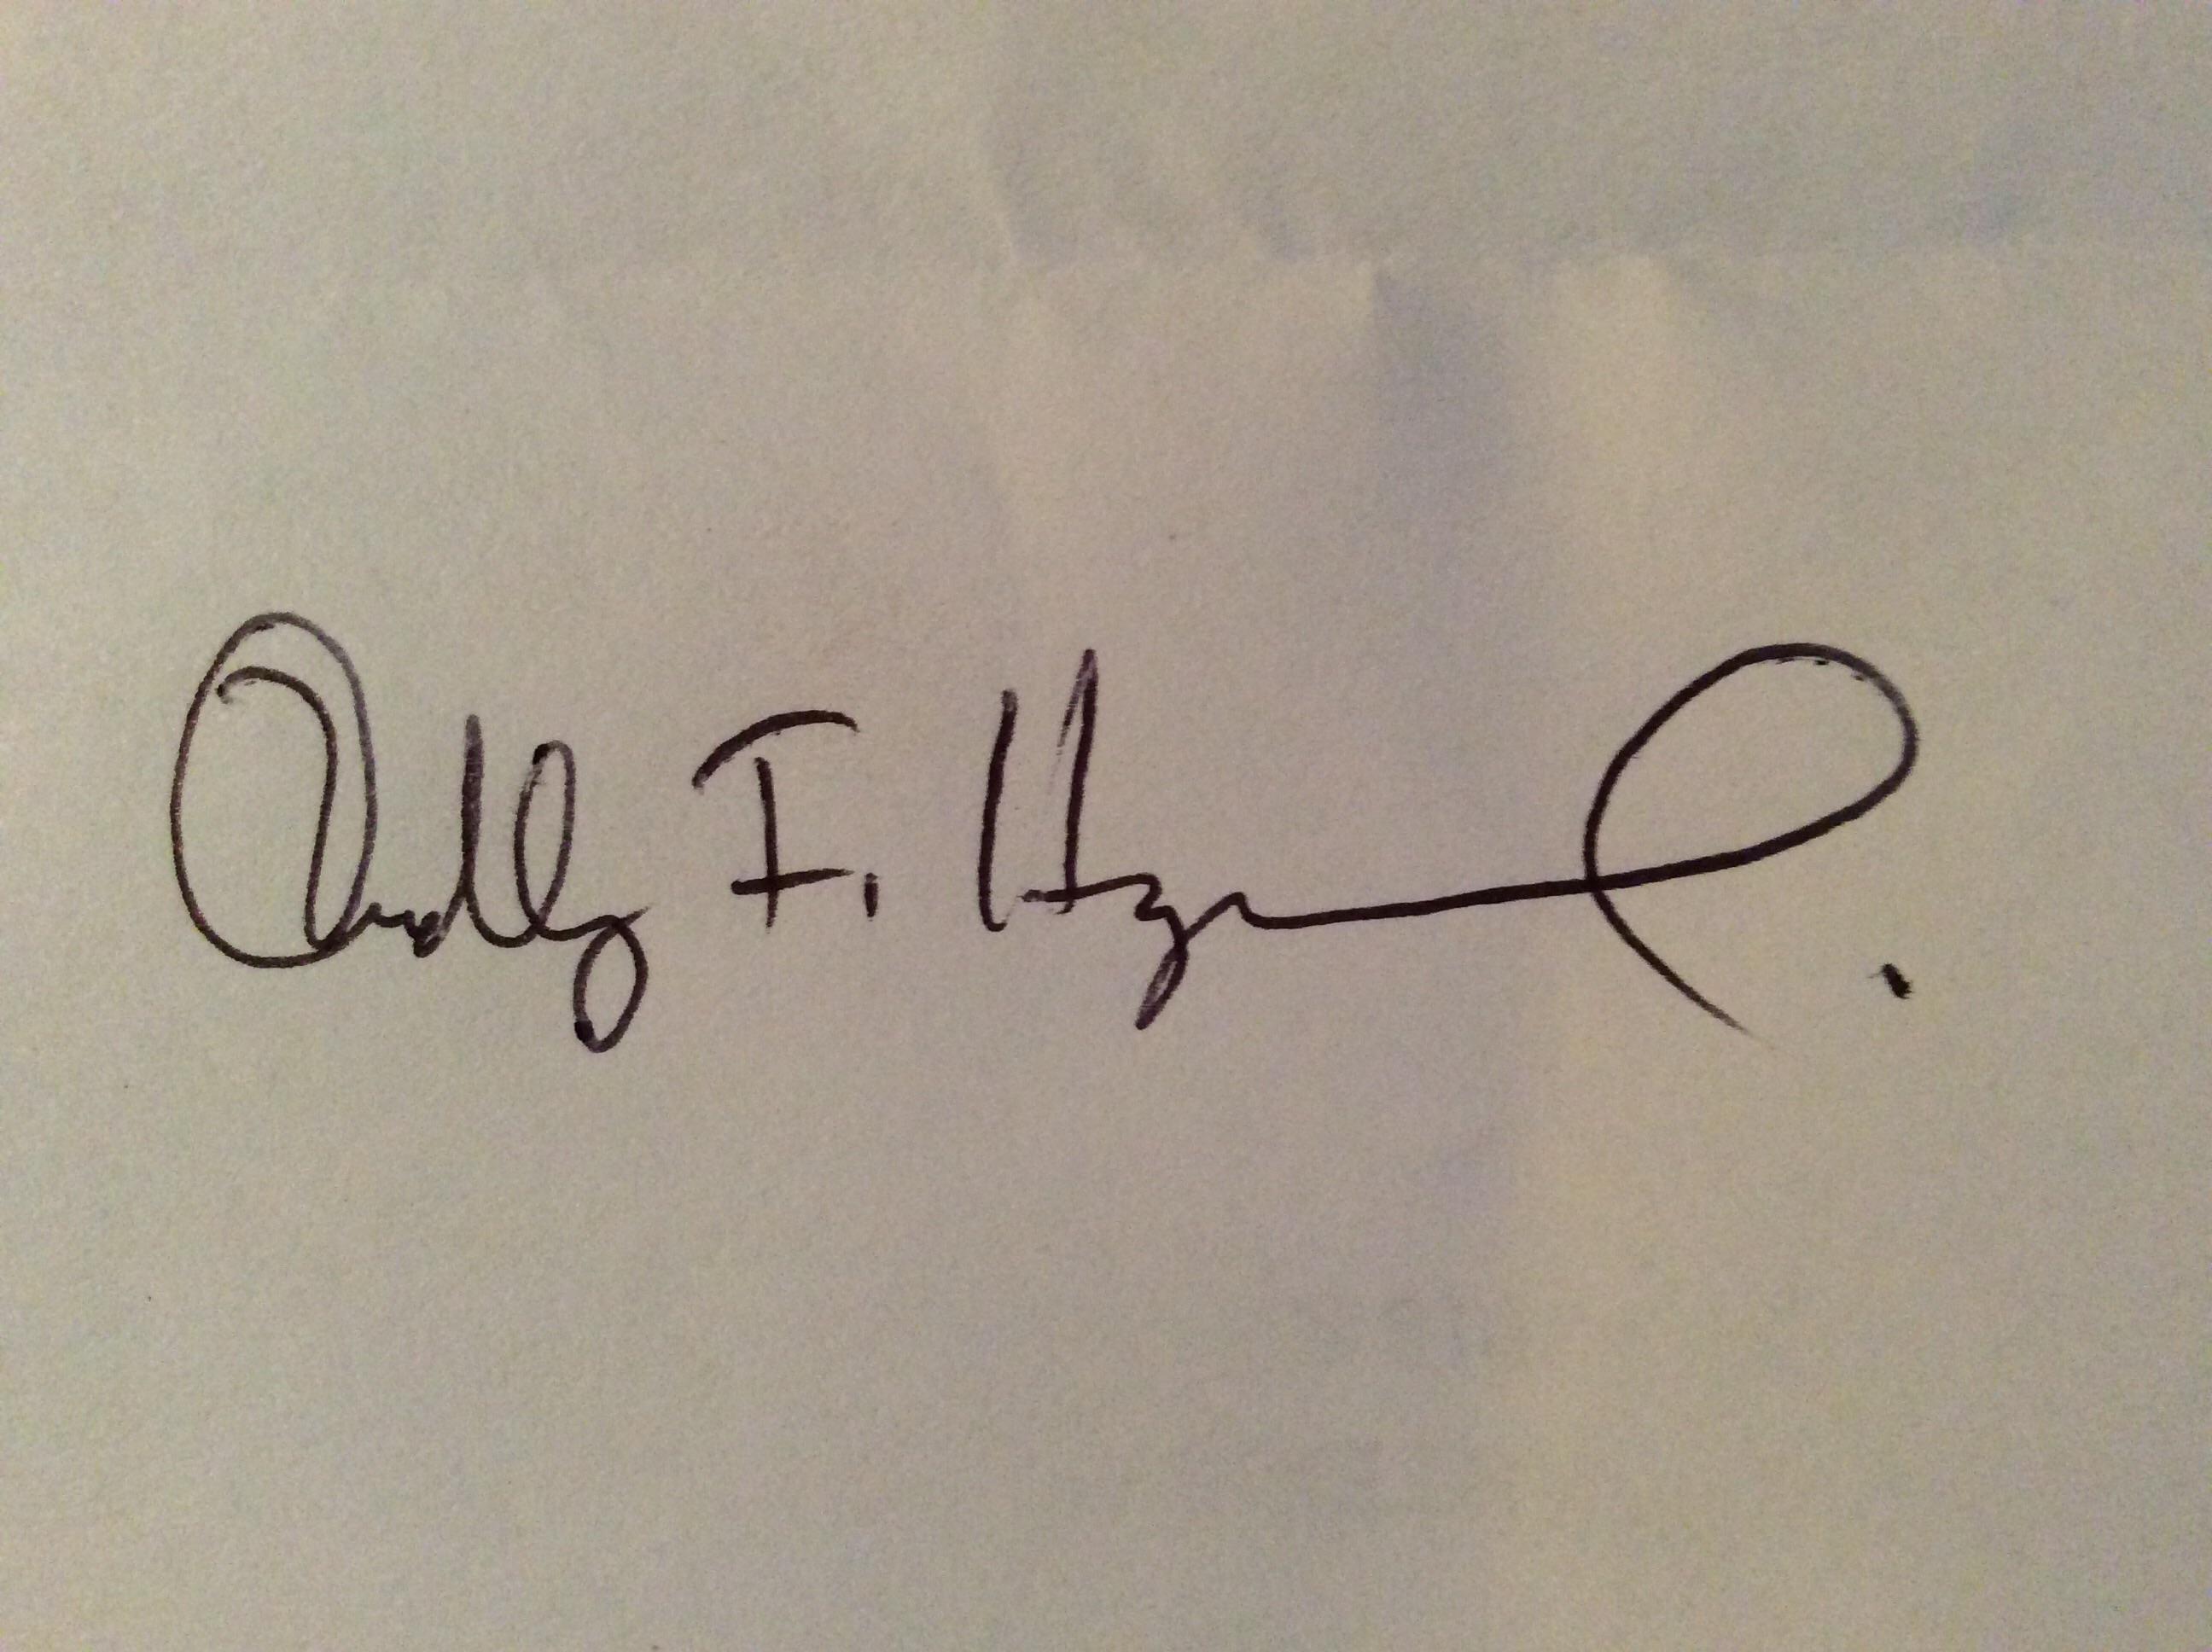 Dudley F Hayward Signature